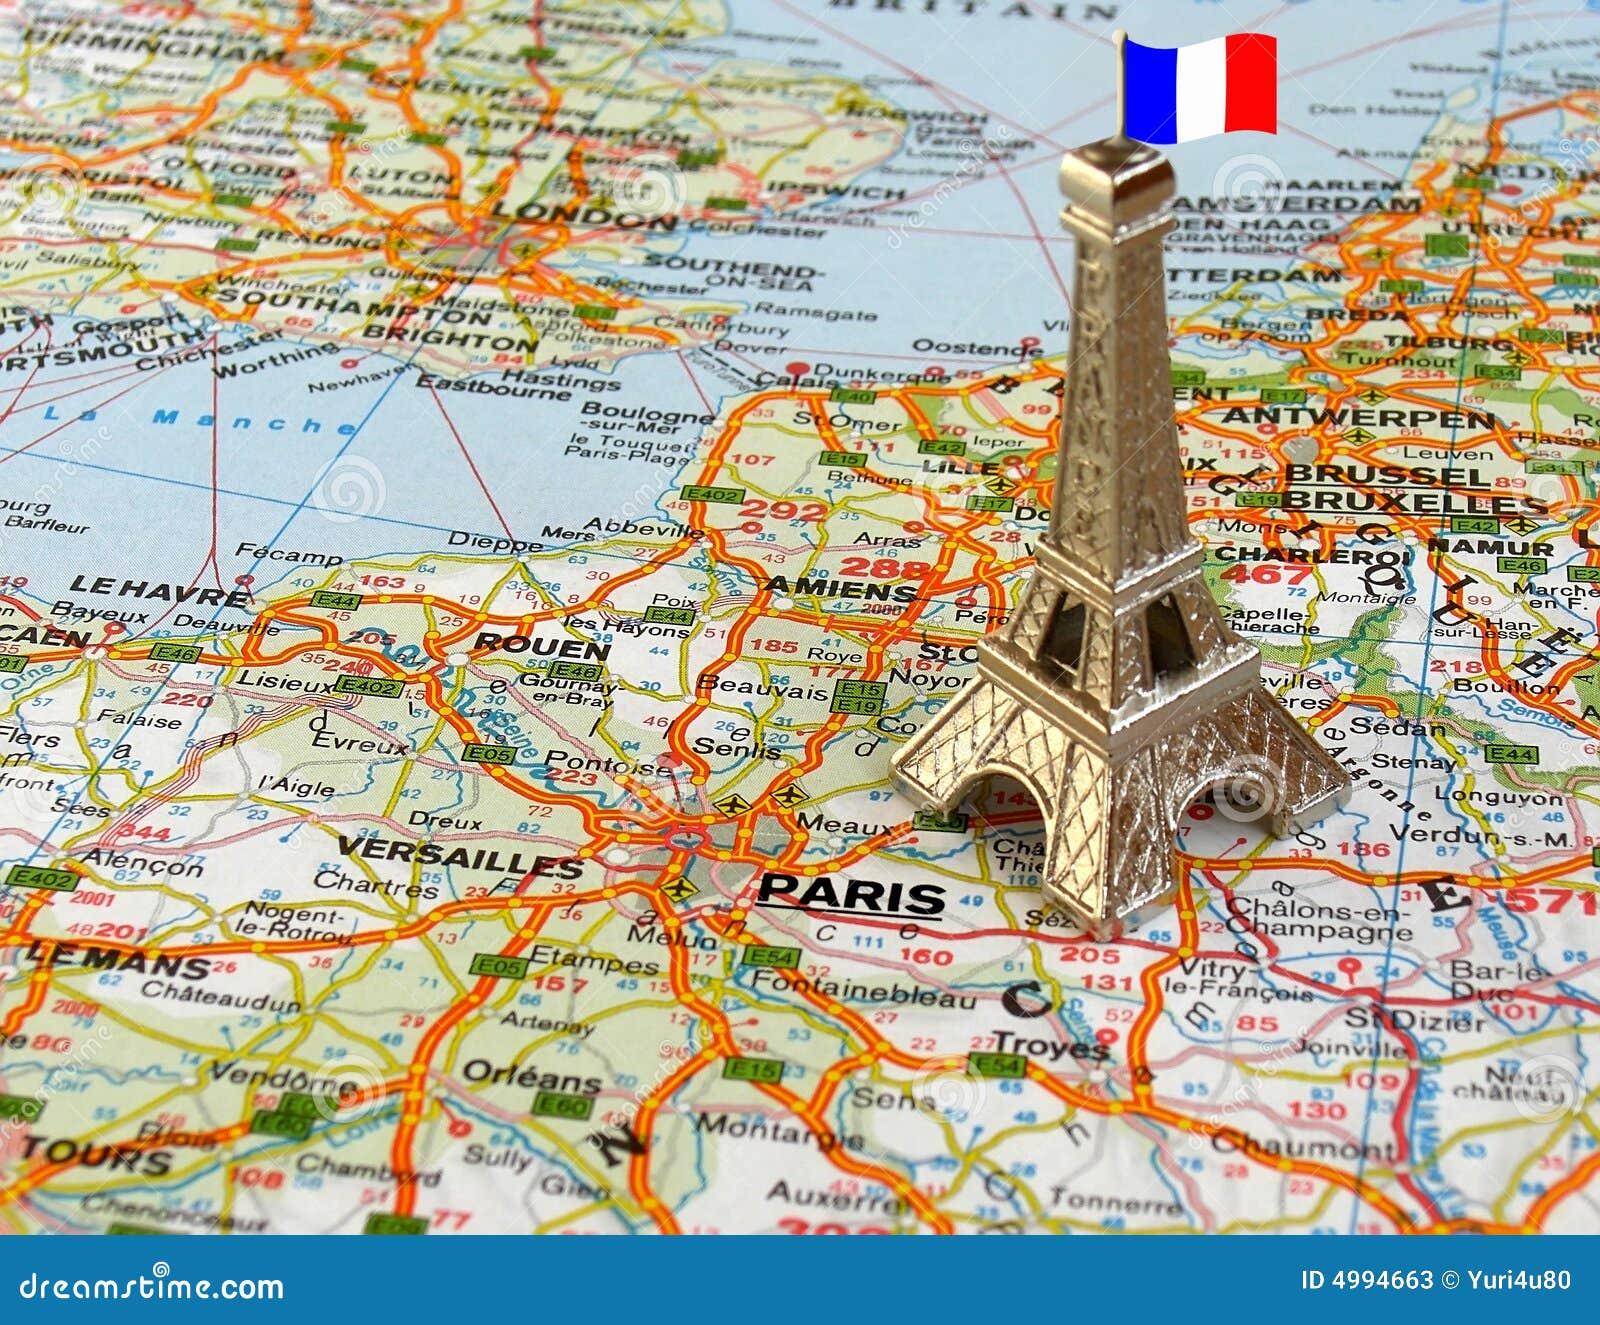 Karte Paris Eiffelturm.Eiffelturm Auf Karte Stockbild Bild Von Makro Kunst 4994663